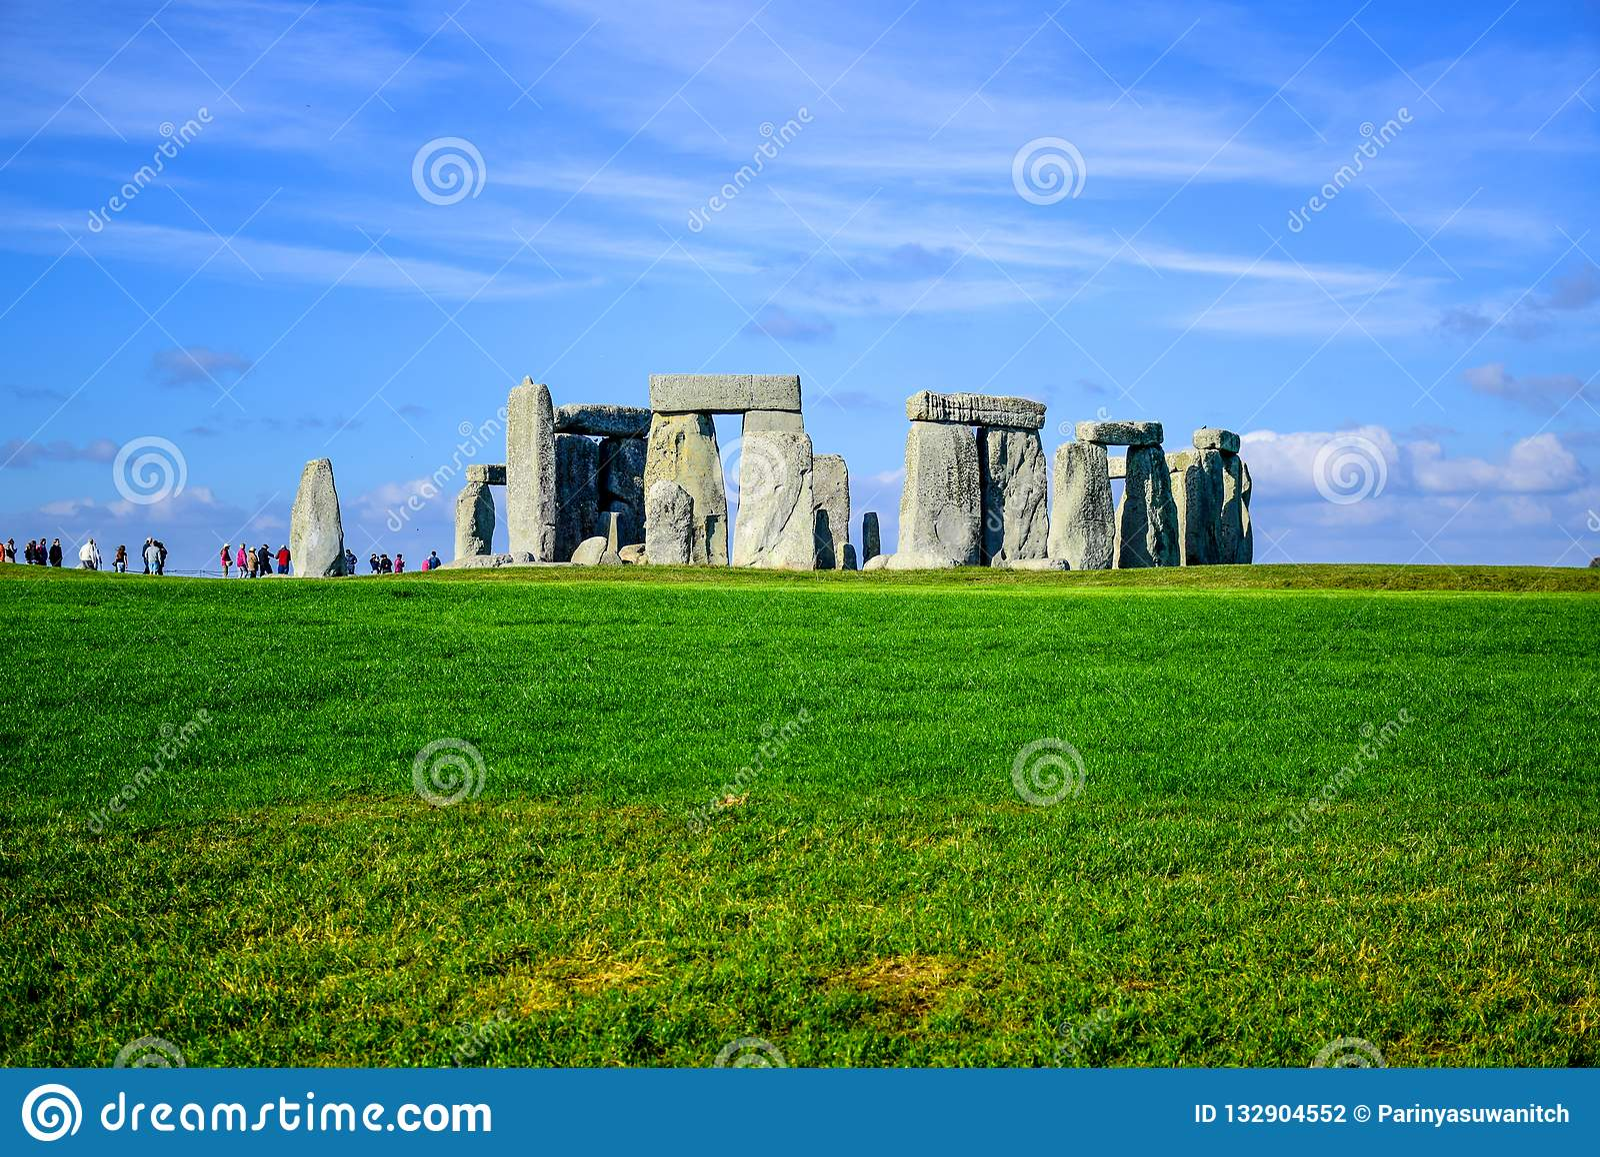 Landscape view of Stonehenge in Salisbury, Wiltshire, England, UK